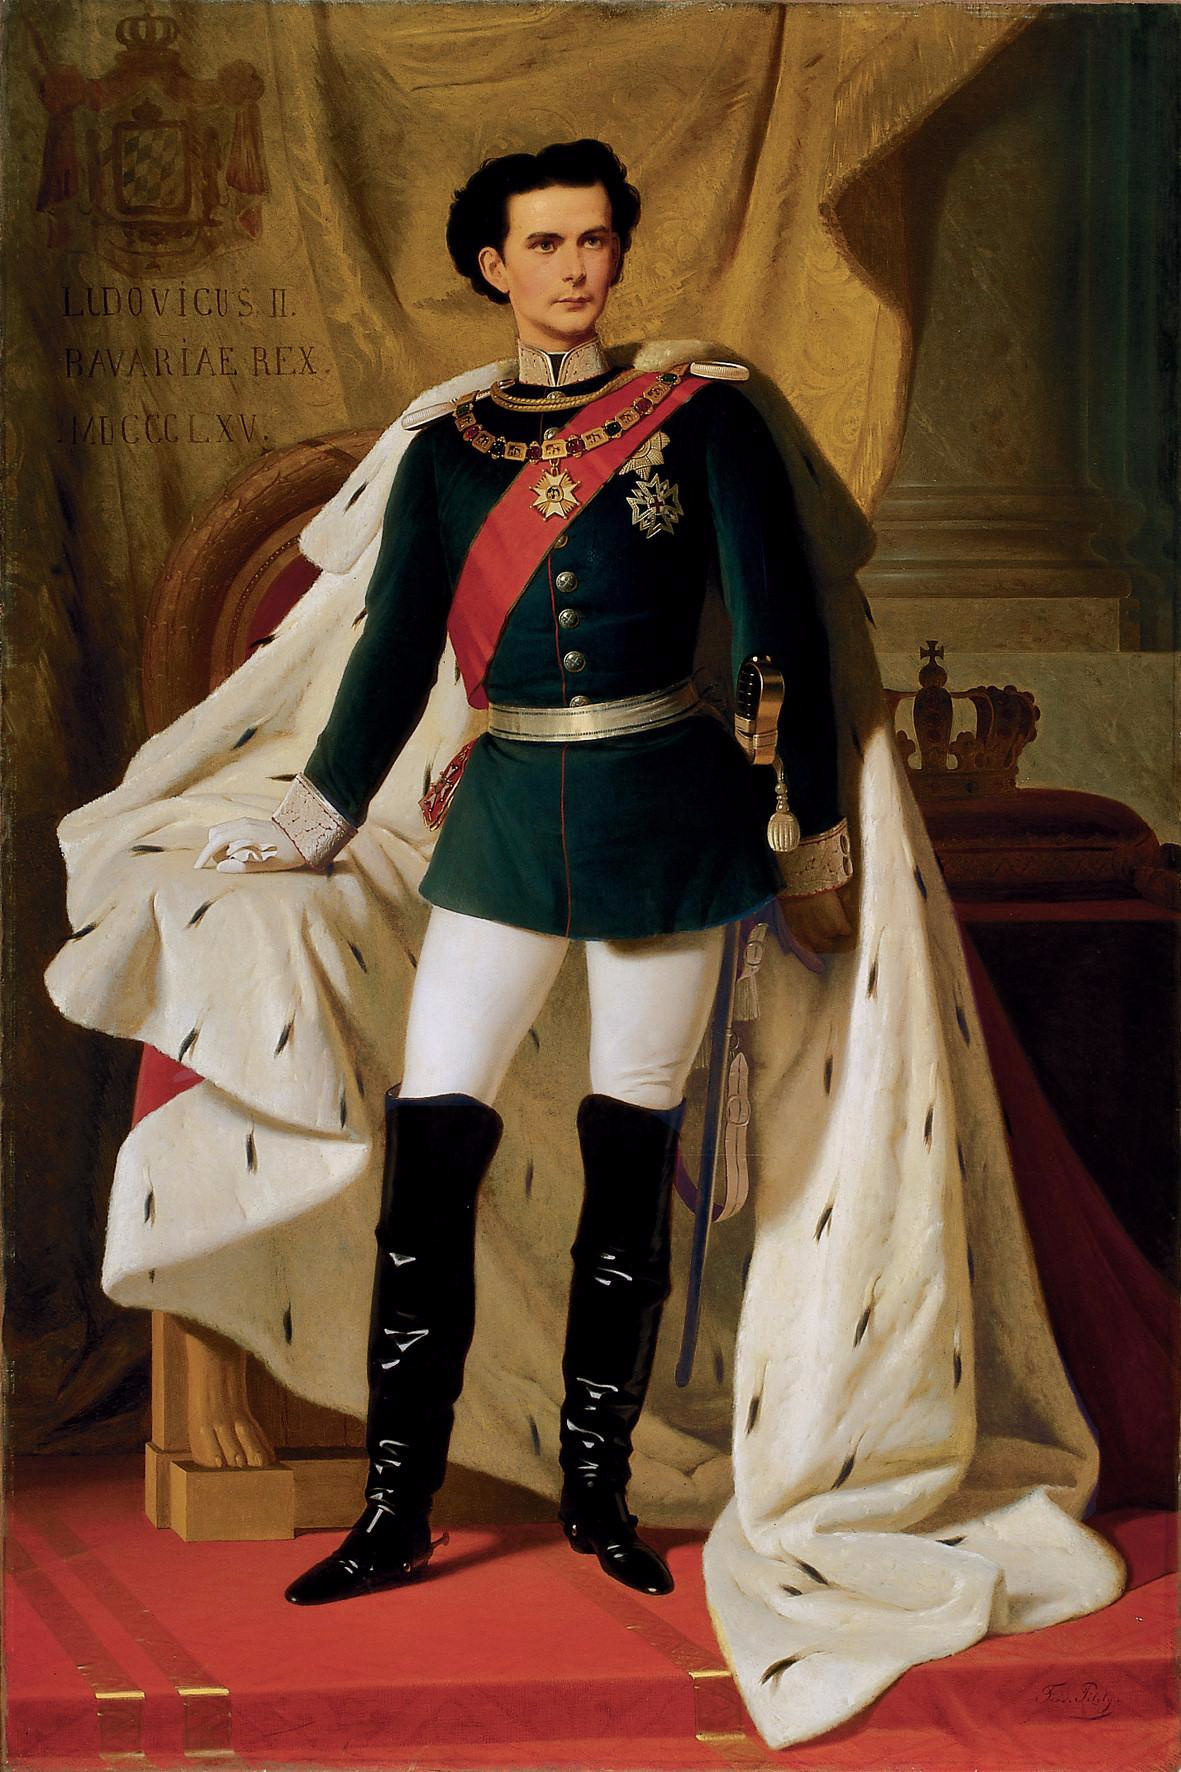 Ferdinand Von Pilots. Ludwig II of Bavaria in the coronation mantle